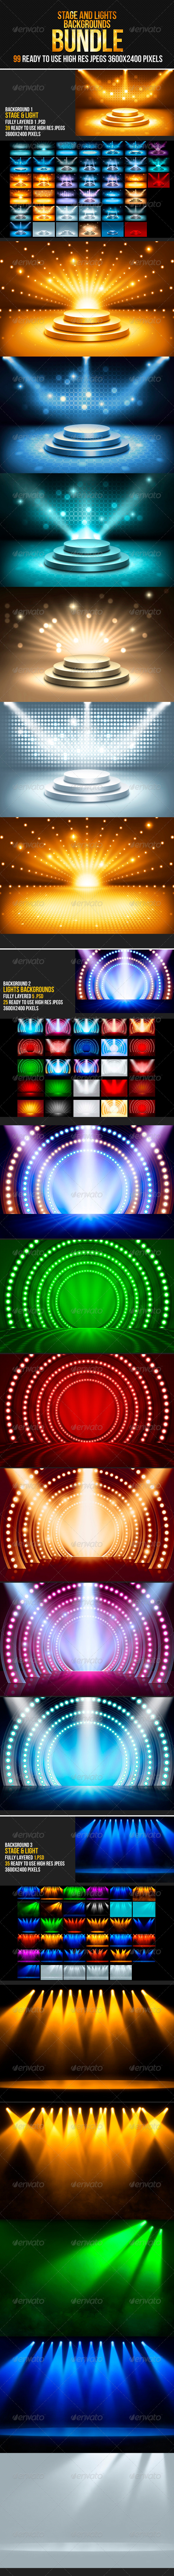 GraphicRiver Stage & Lights Backgrounds Bundle 6684097